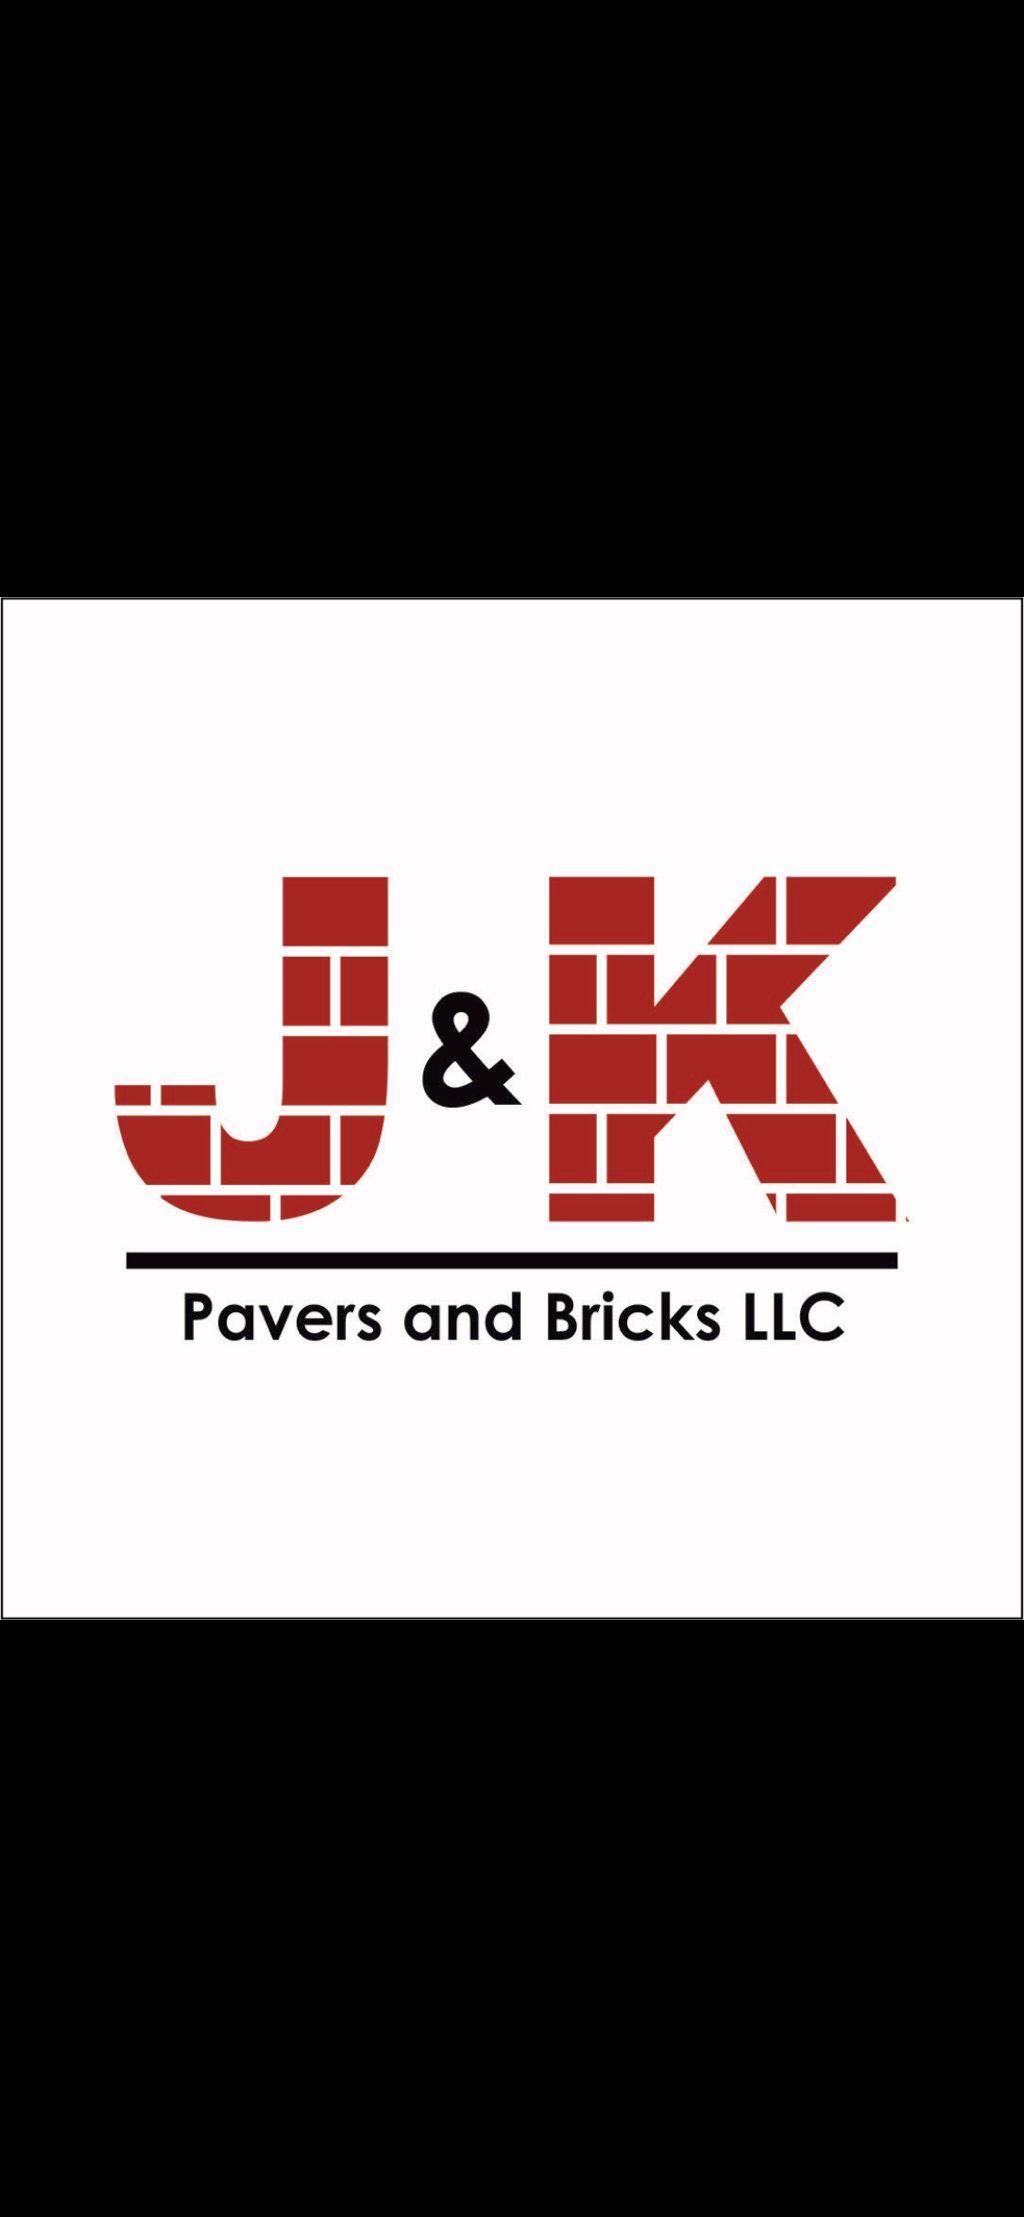 J&K Pavers and Bricks LLC